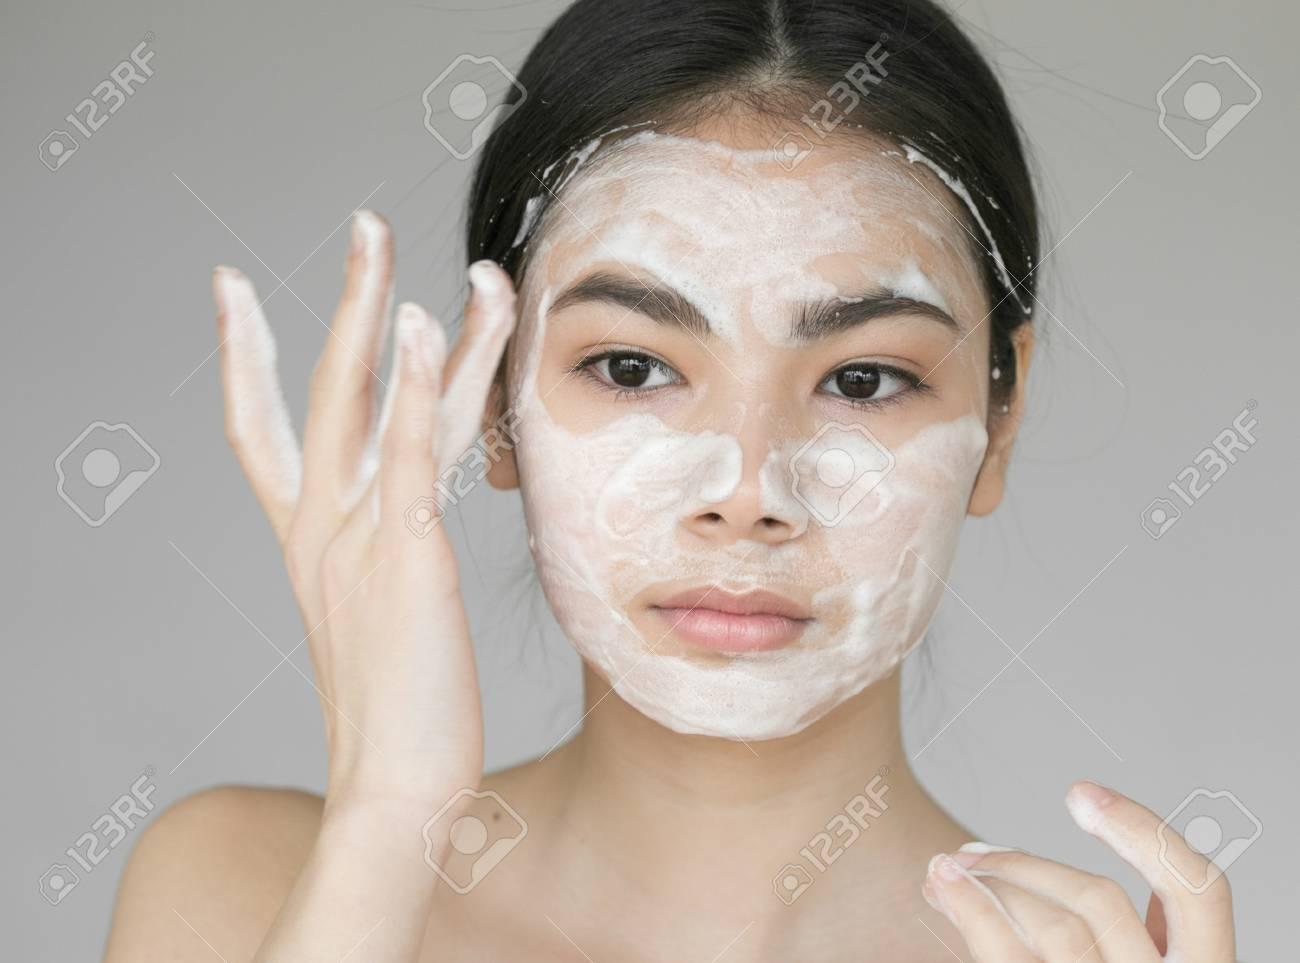 Young beautiful woman washing her face with soap. Studio shot. - 79703793